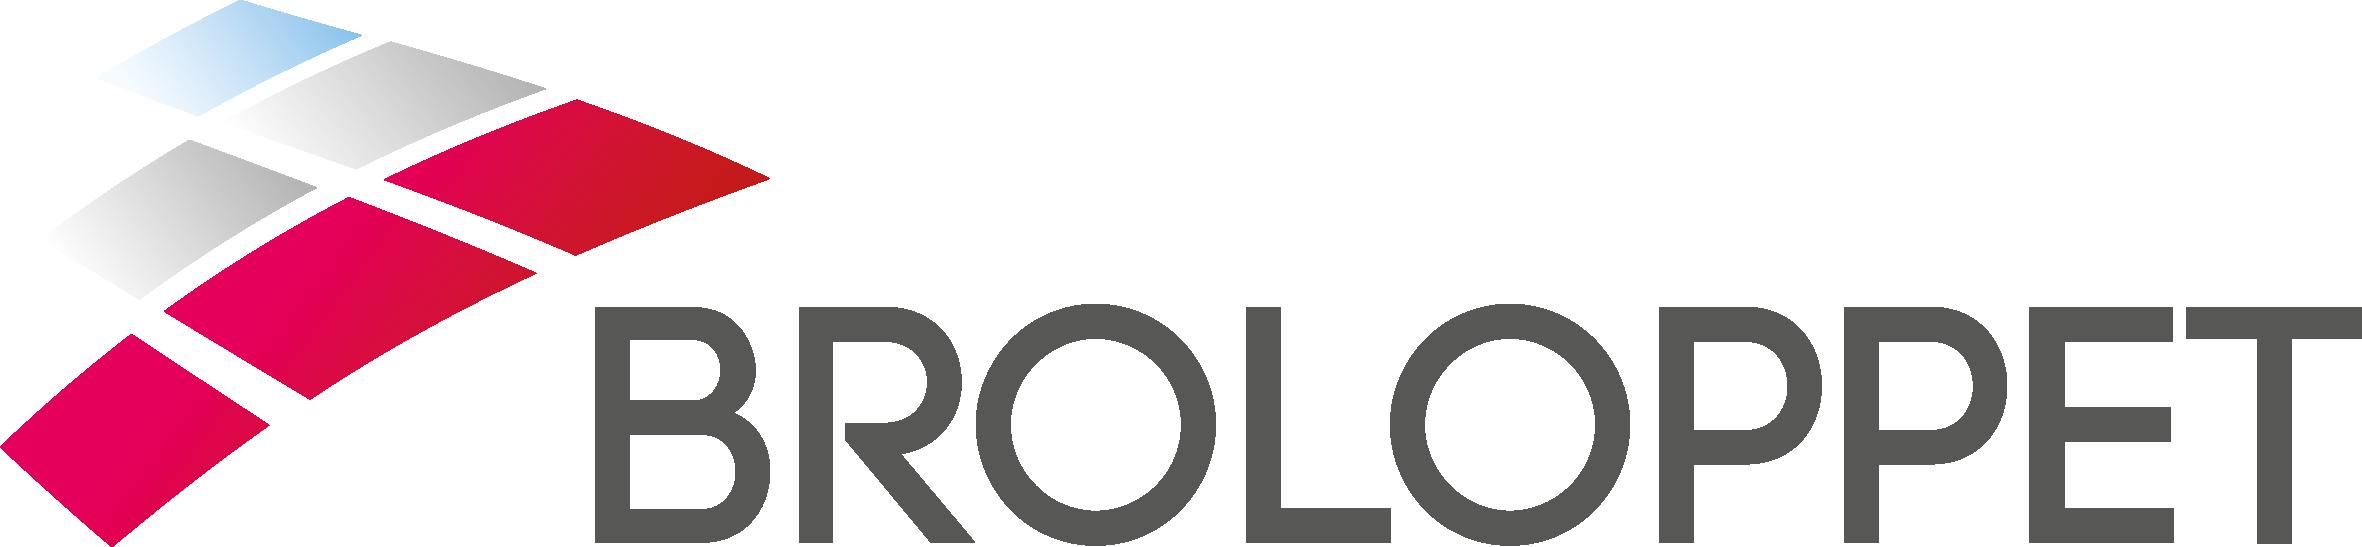 NyaBroloppet